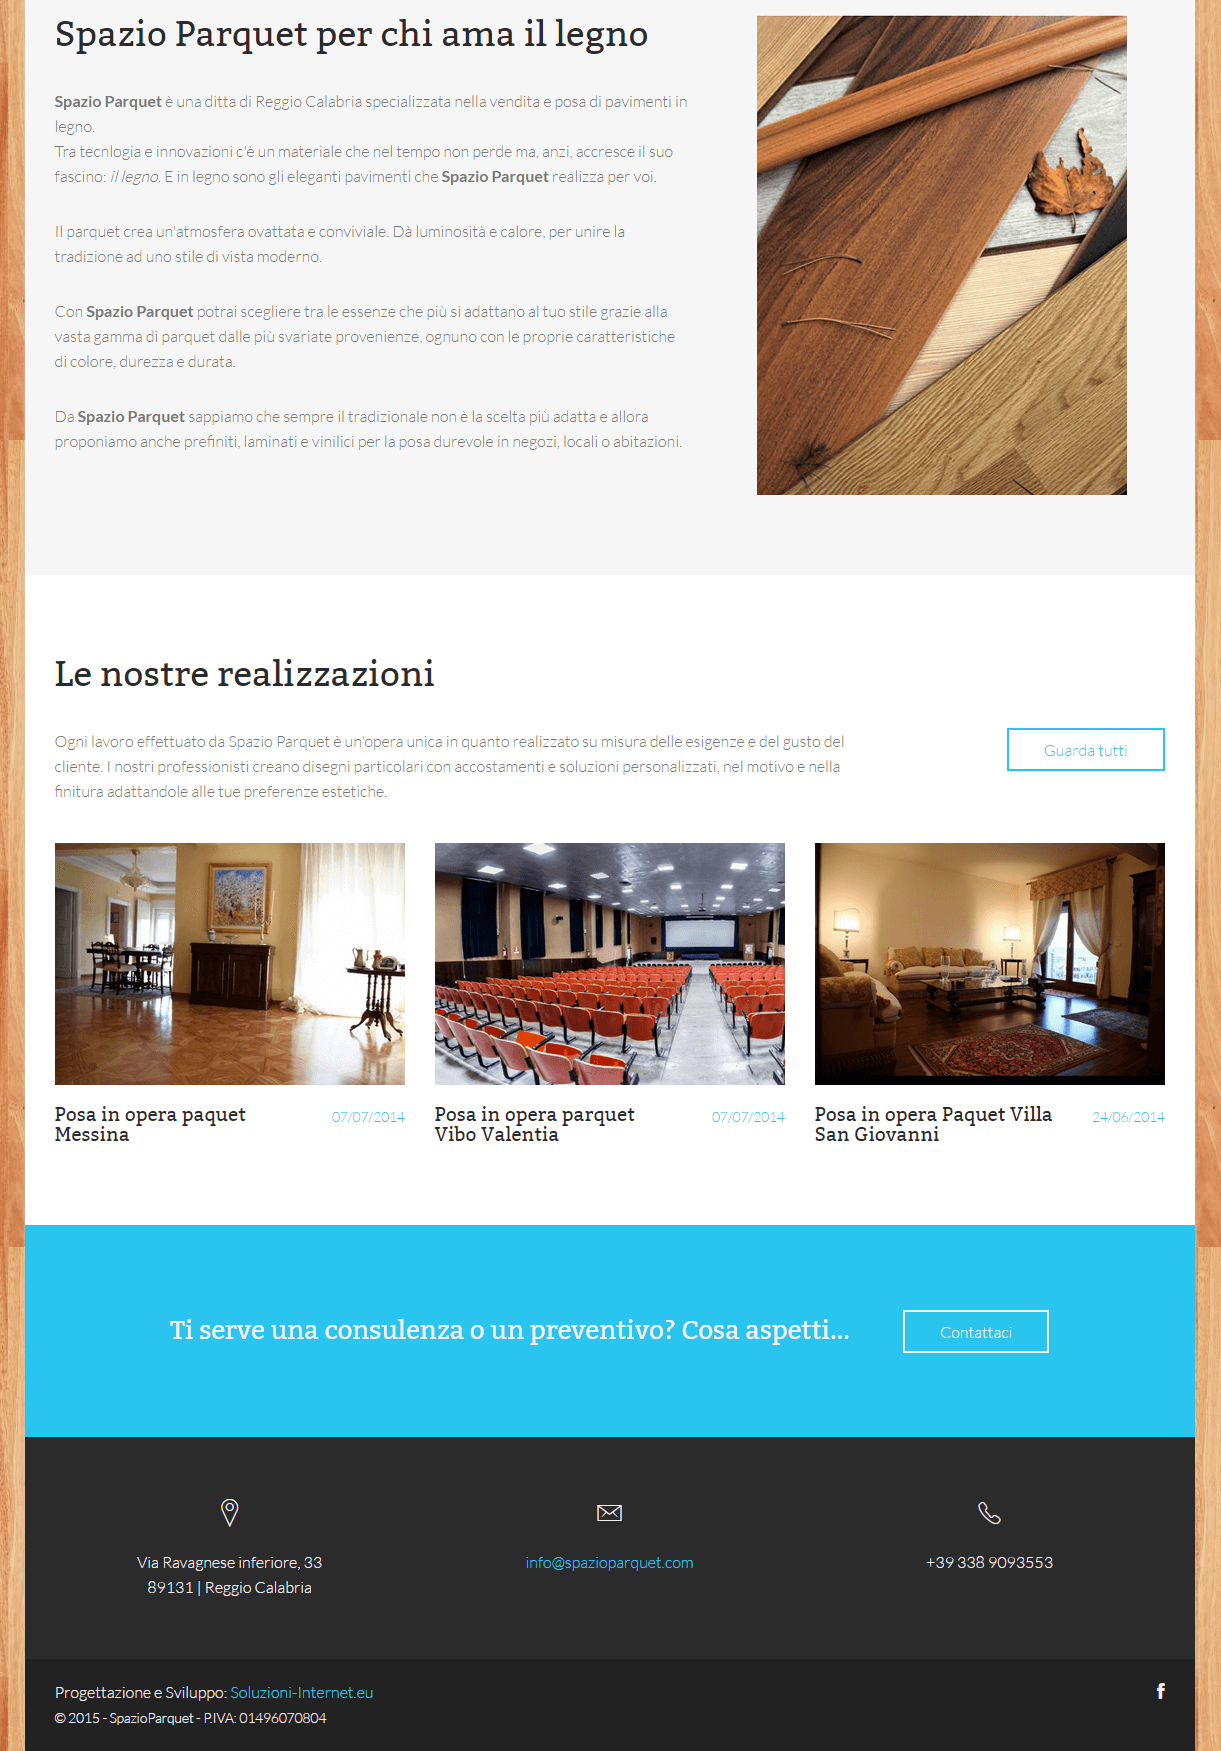 Spazio Parquet - Parte bassa Home Page